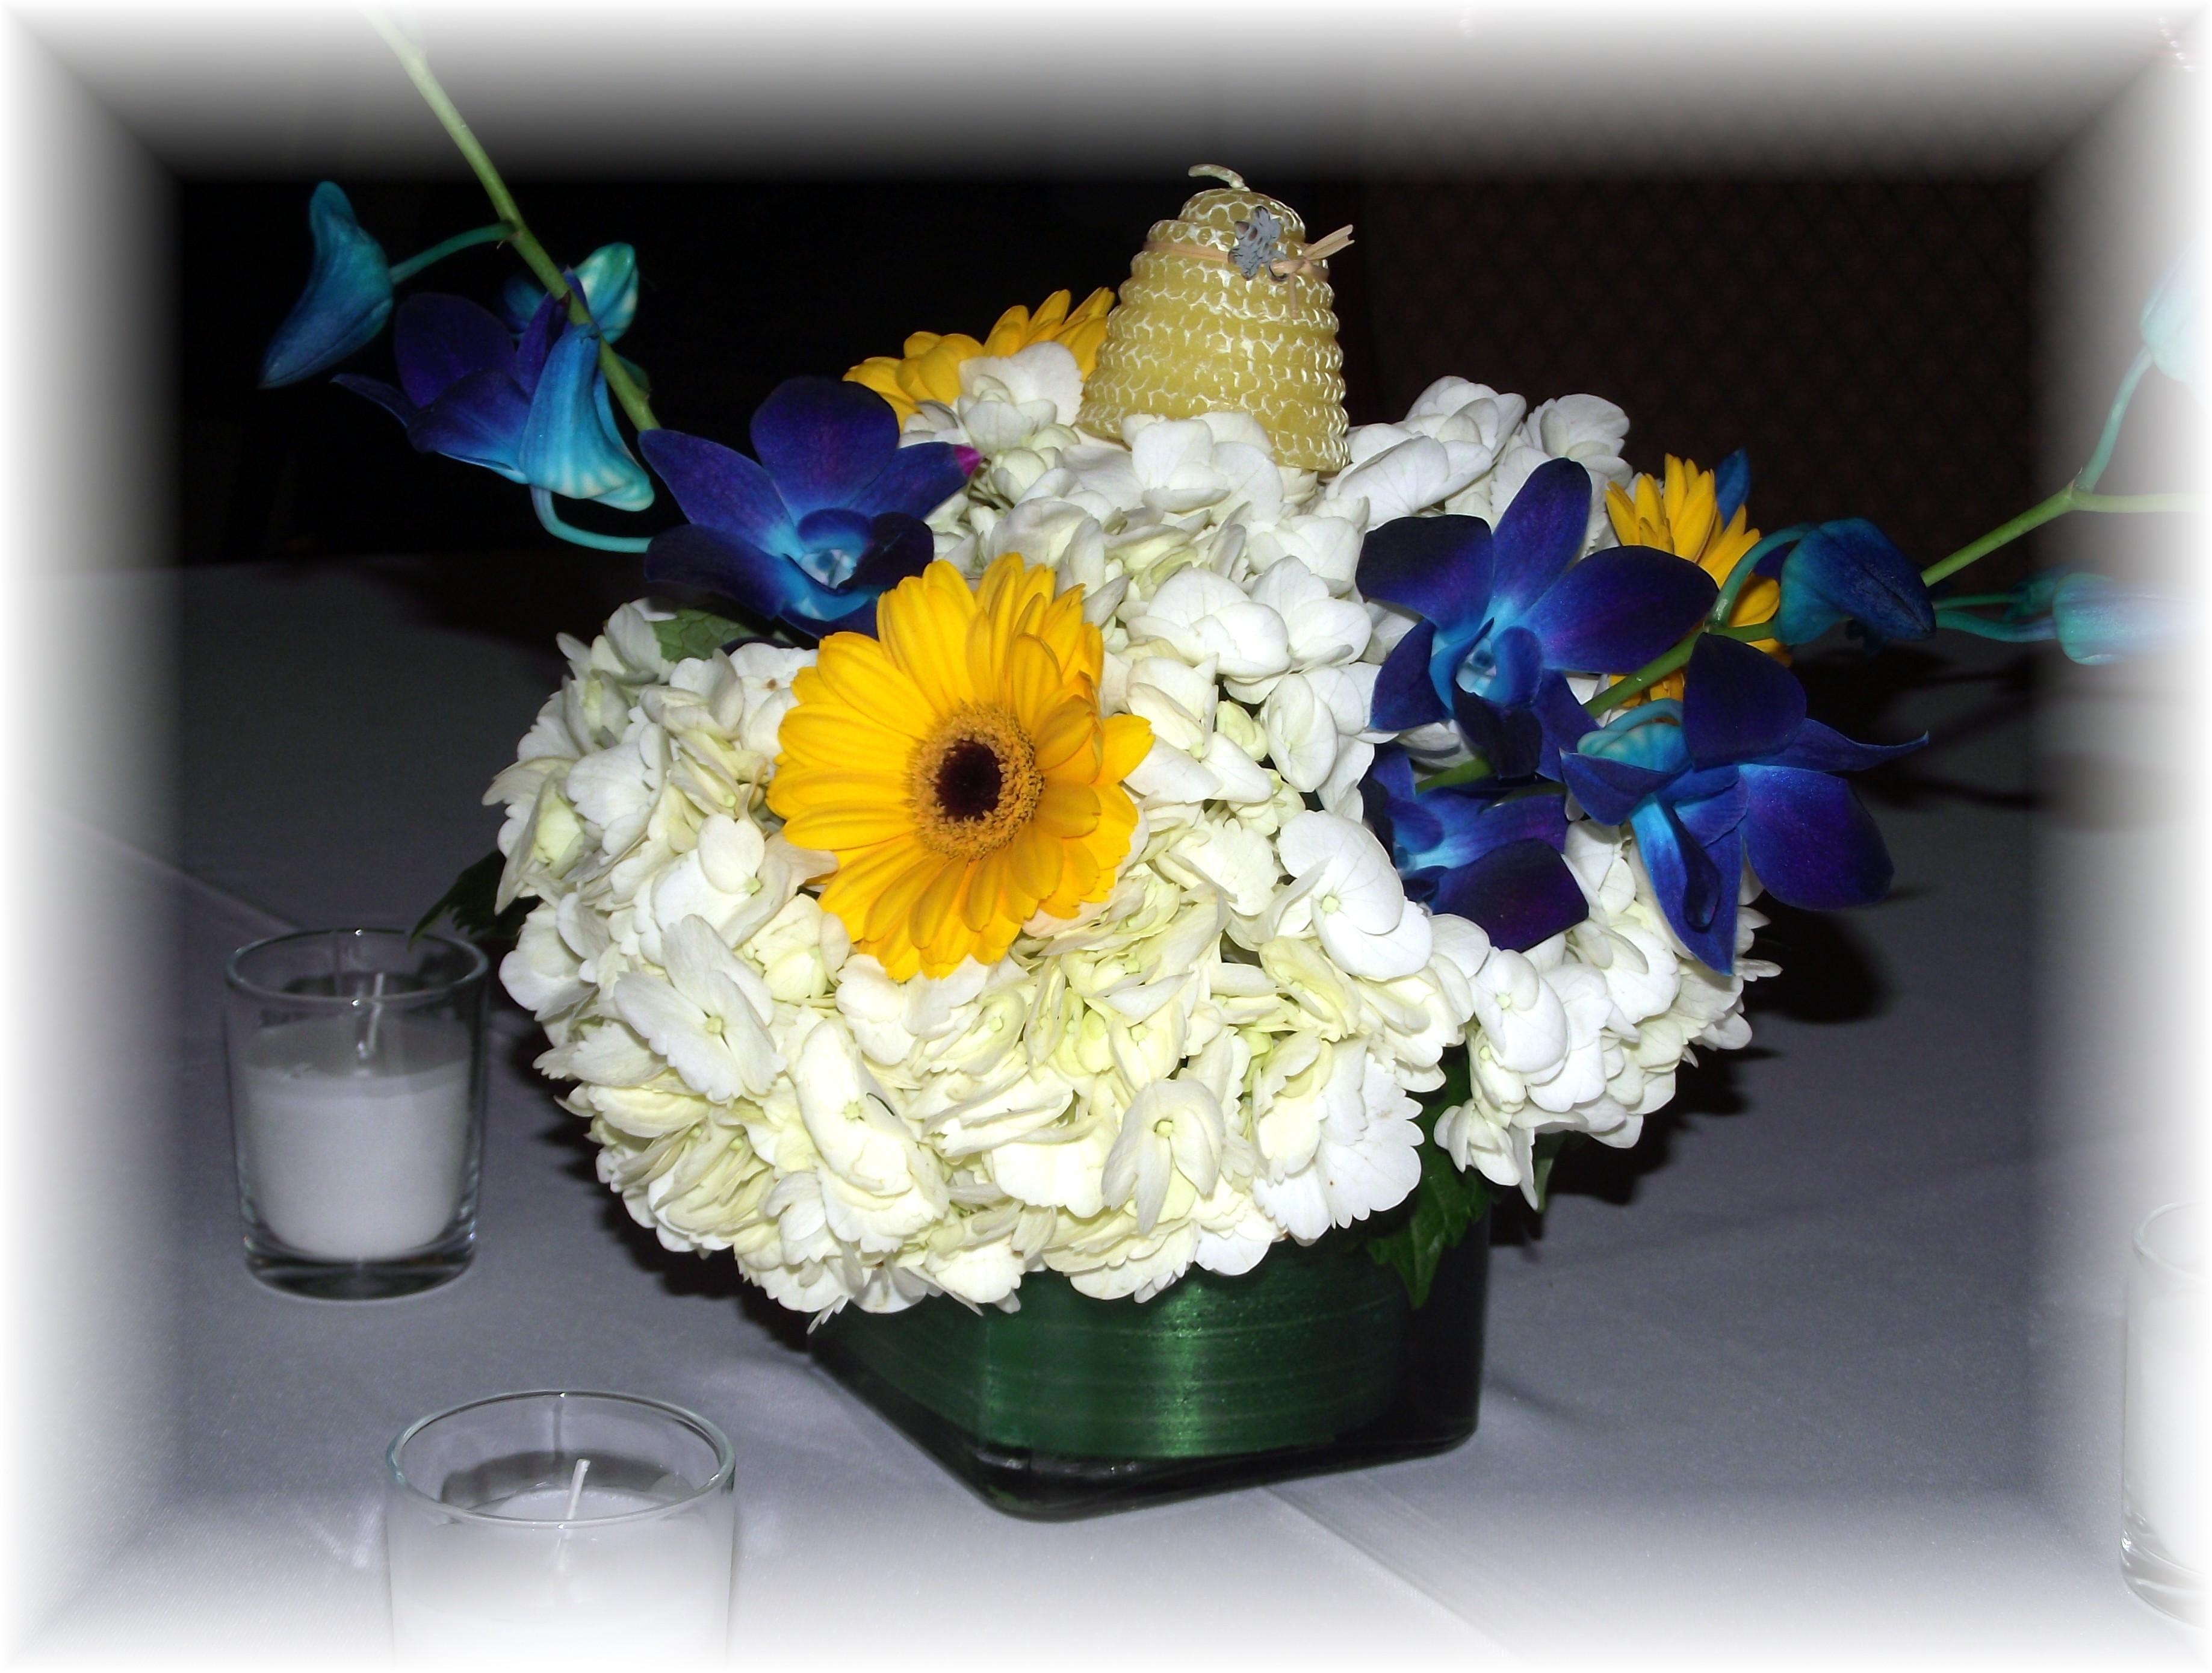 Hydrangea, daisy, orchid centerpiece